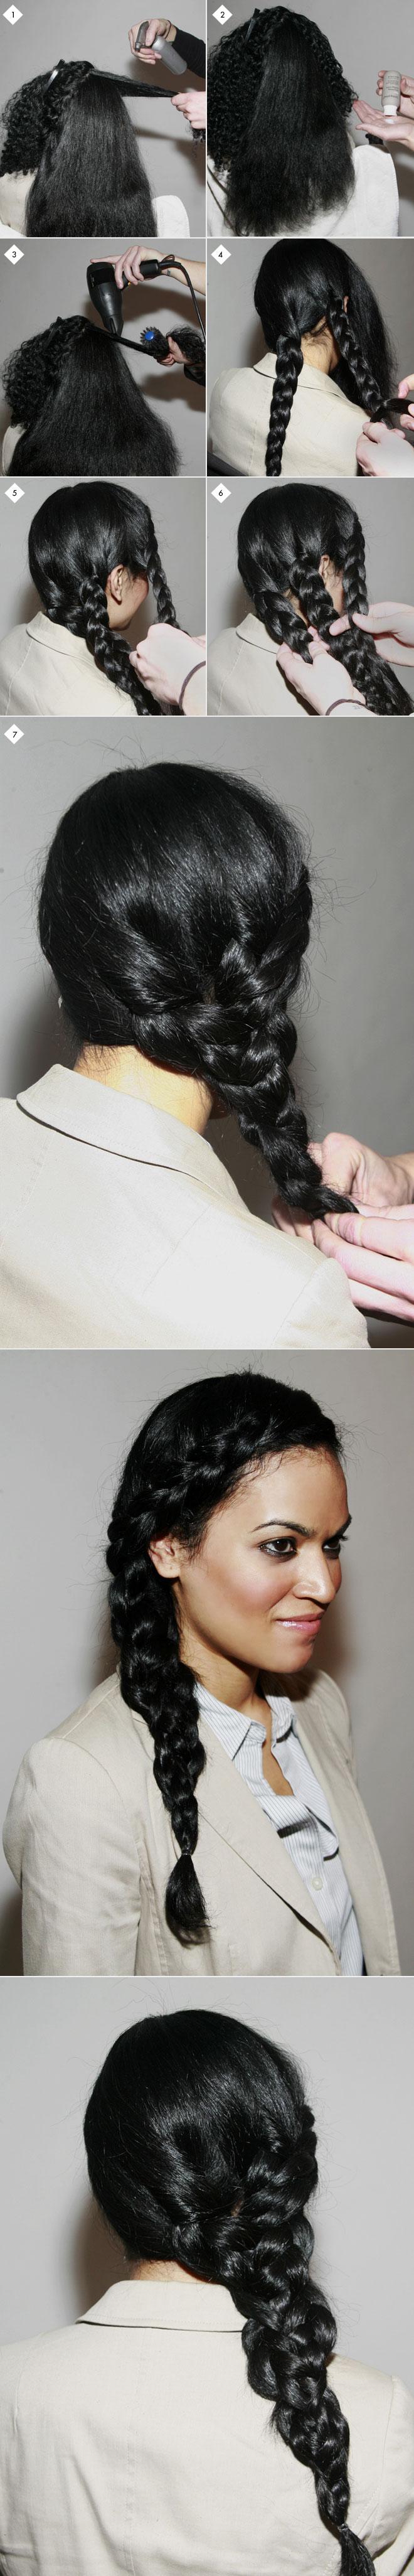 Triple side braid: how-to